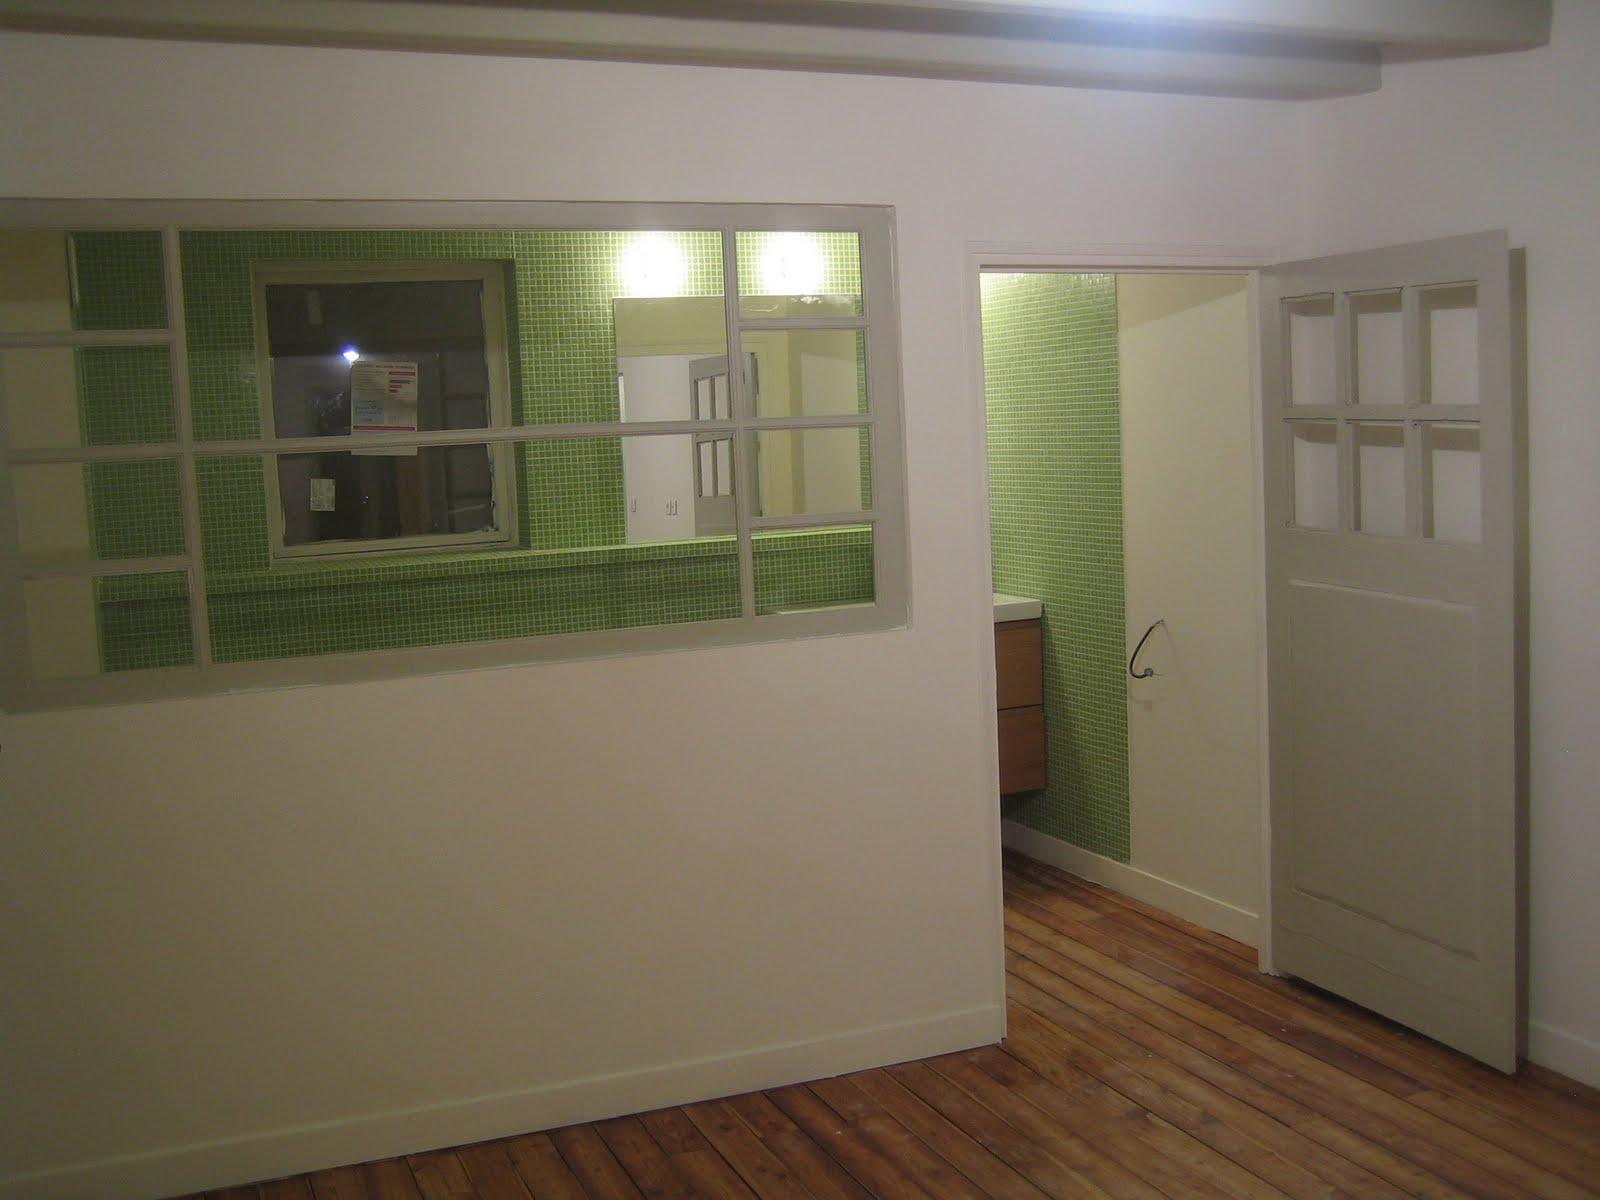 pavupapri la salle de bain verte. Black Bedroom Furniture Sets. Home Design Ideas